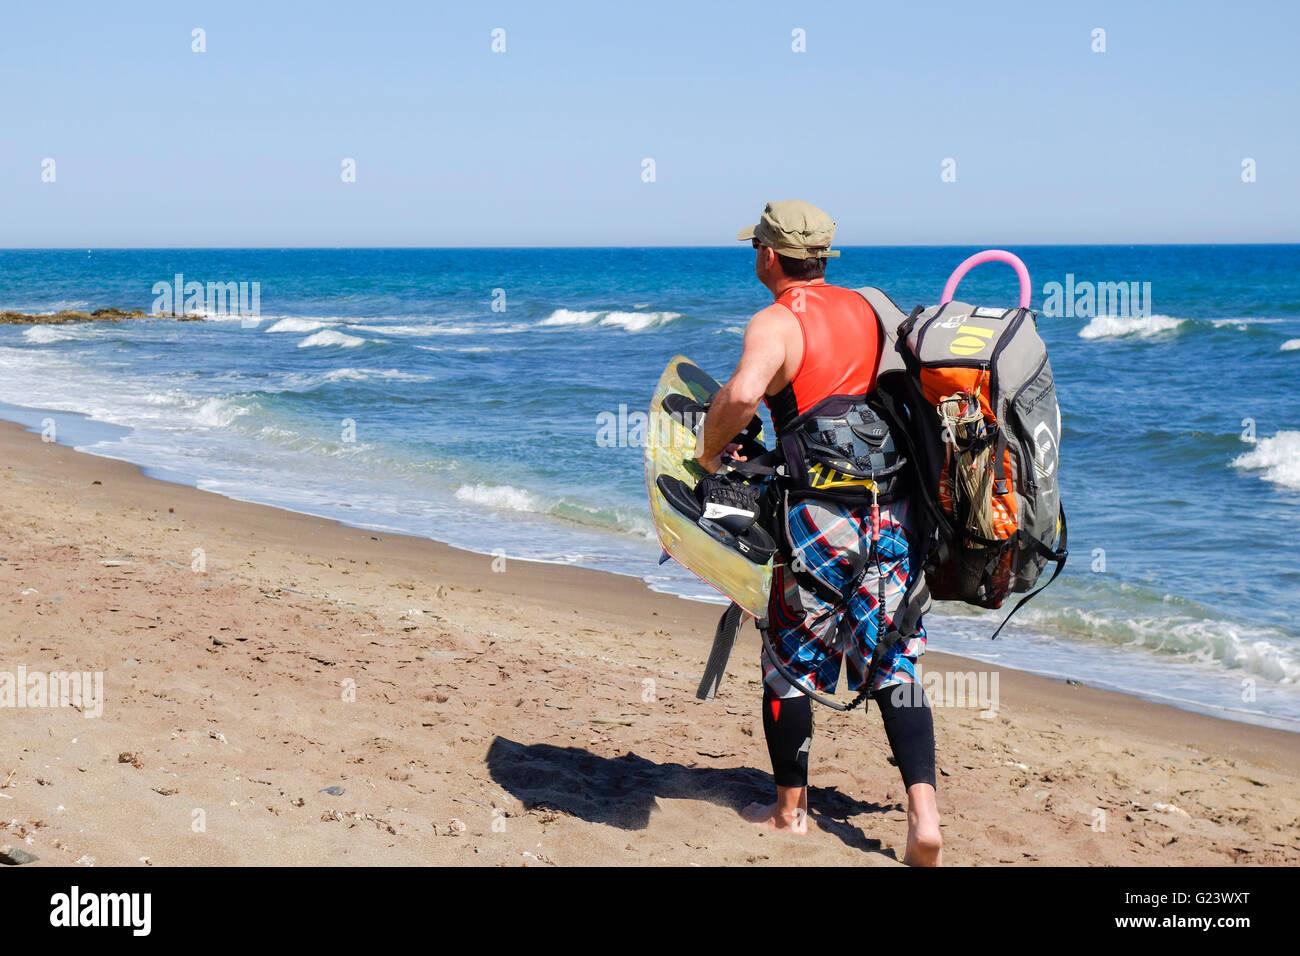 Kitesurfer carrying heavy gear at mediterranean sea kitesurfing, kitesurf,  Malaga, Spain. - Stock Image